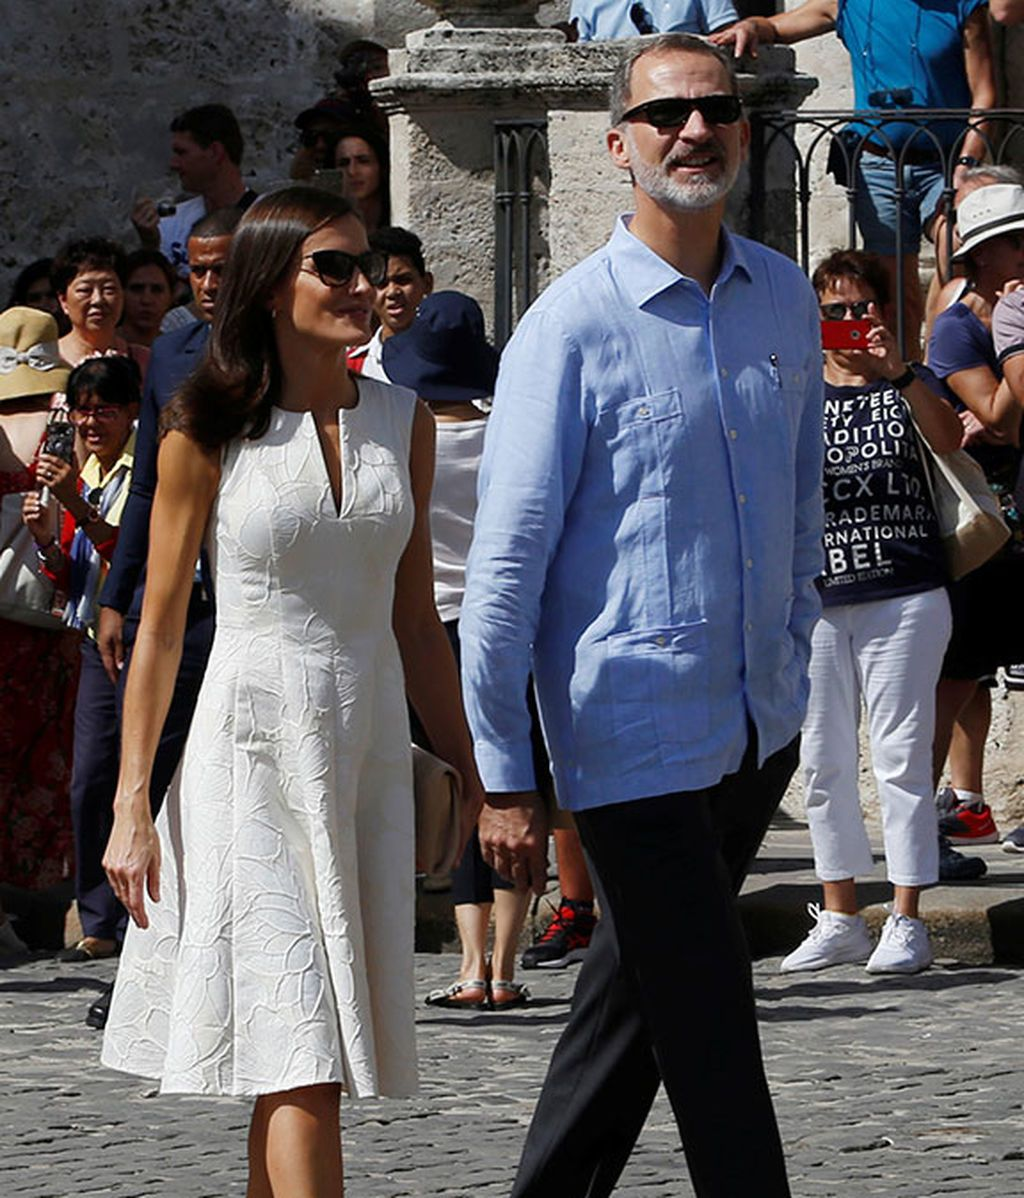 Felipe y Letizia paseando de la mano por la Habana Vieja